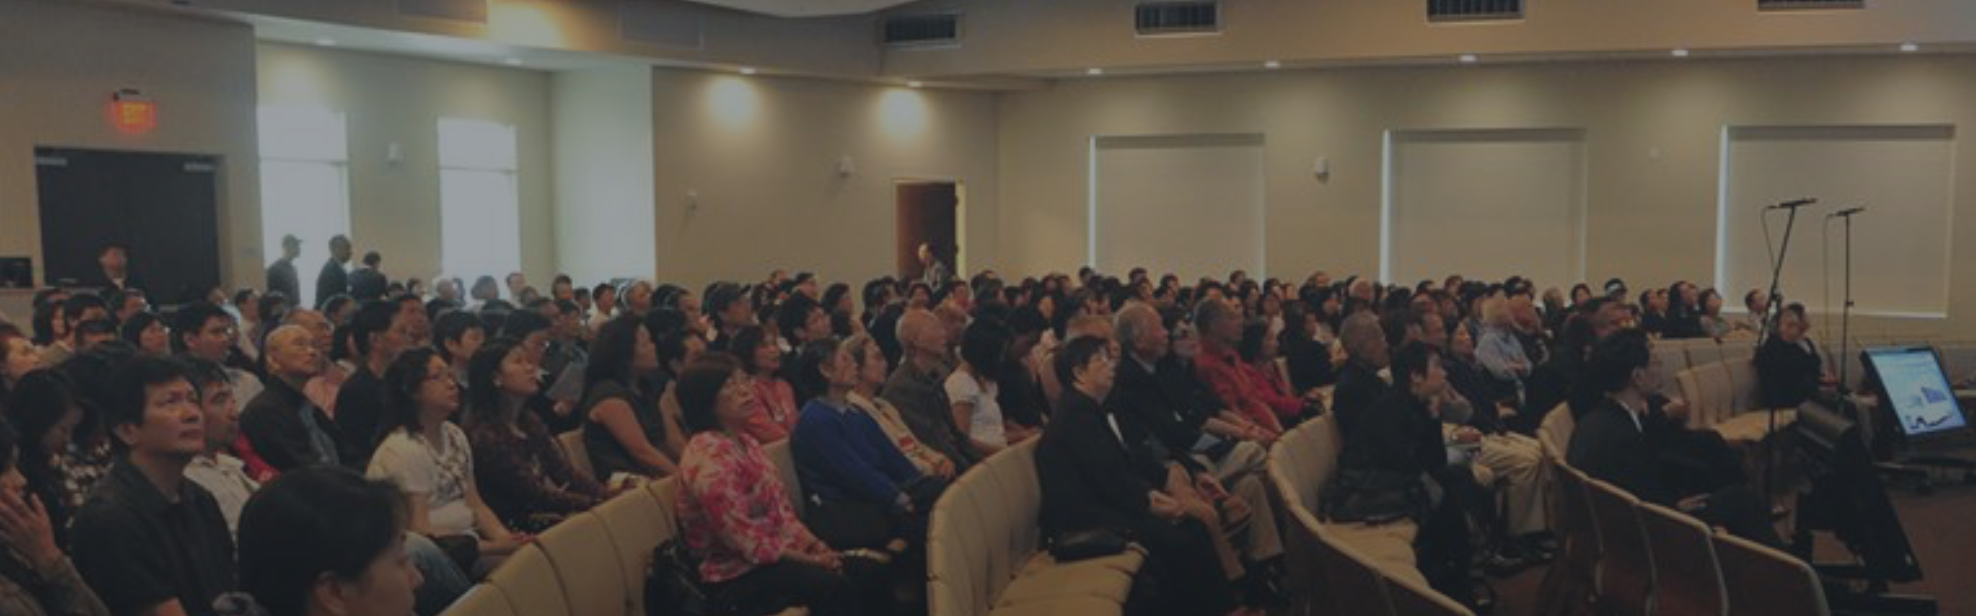 Chinese American church